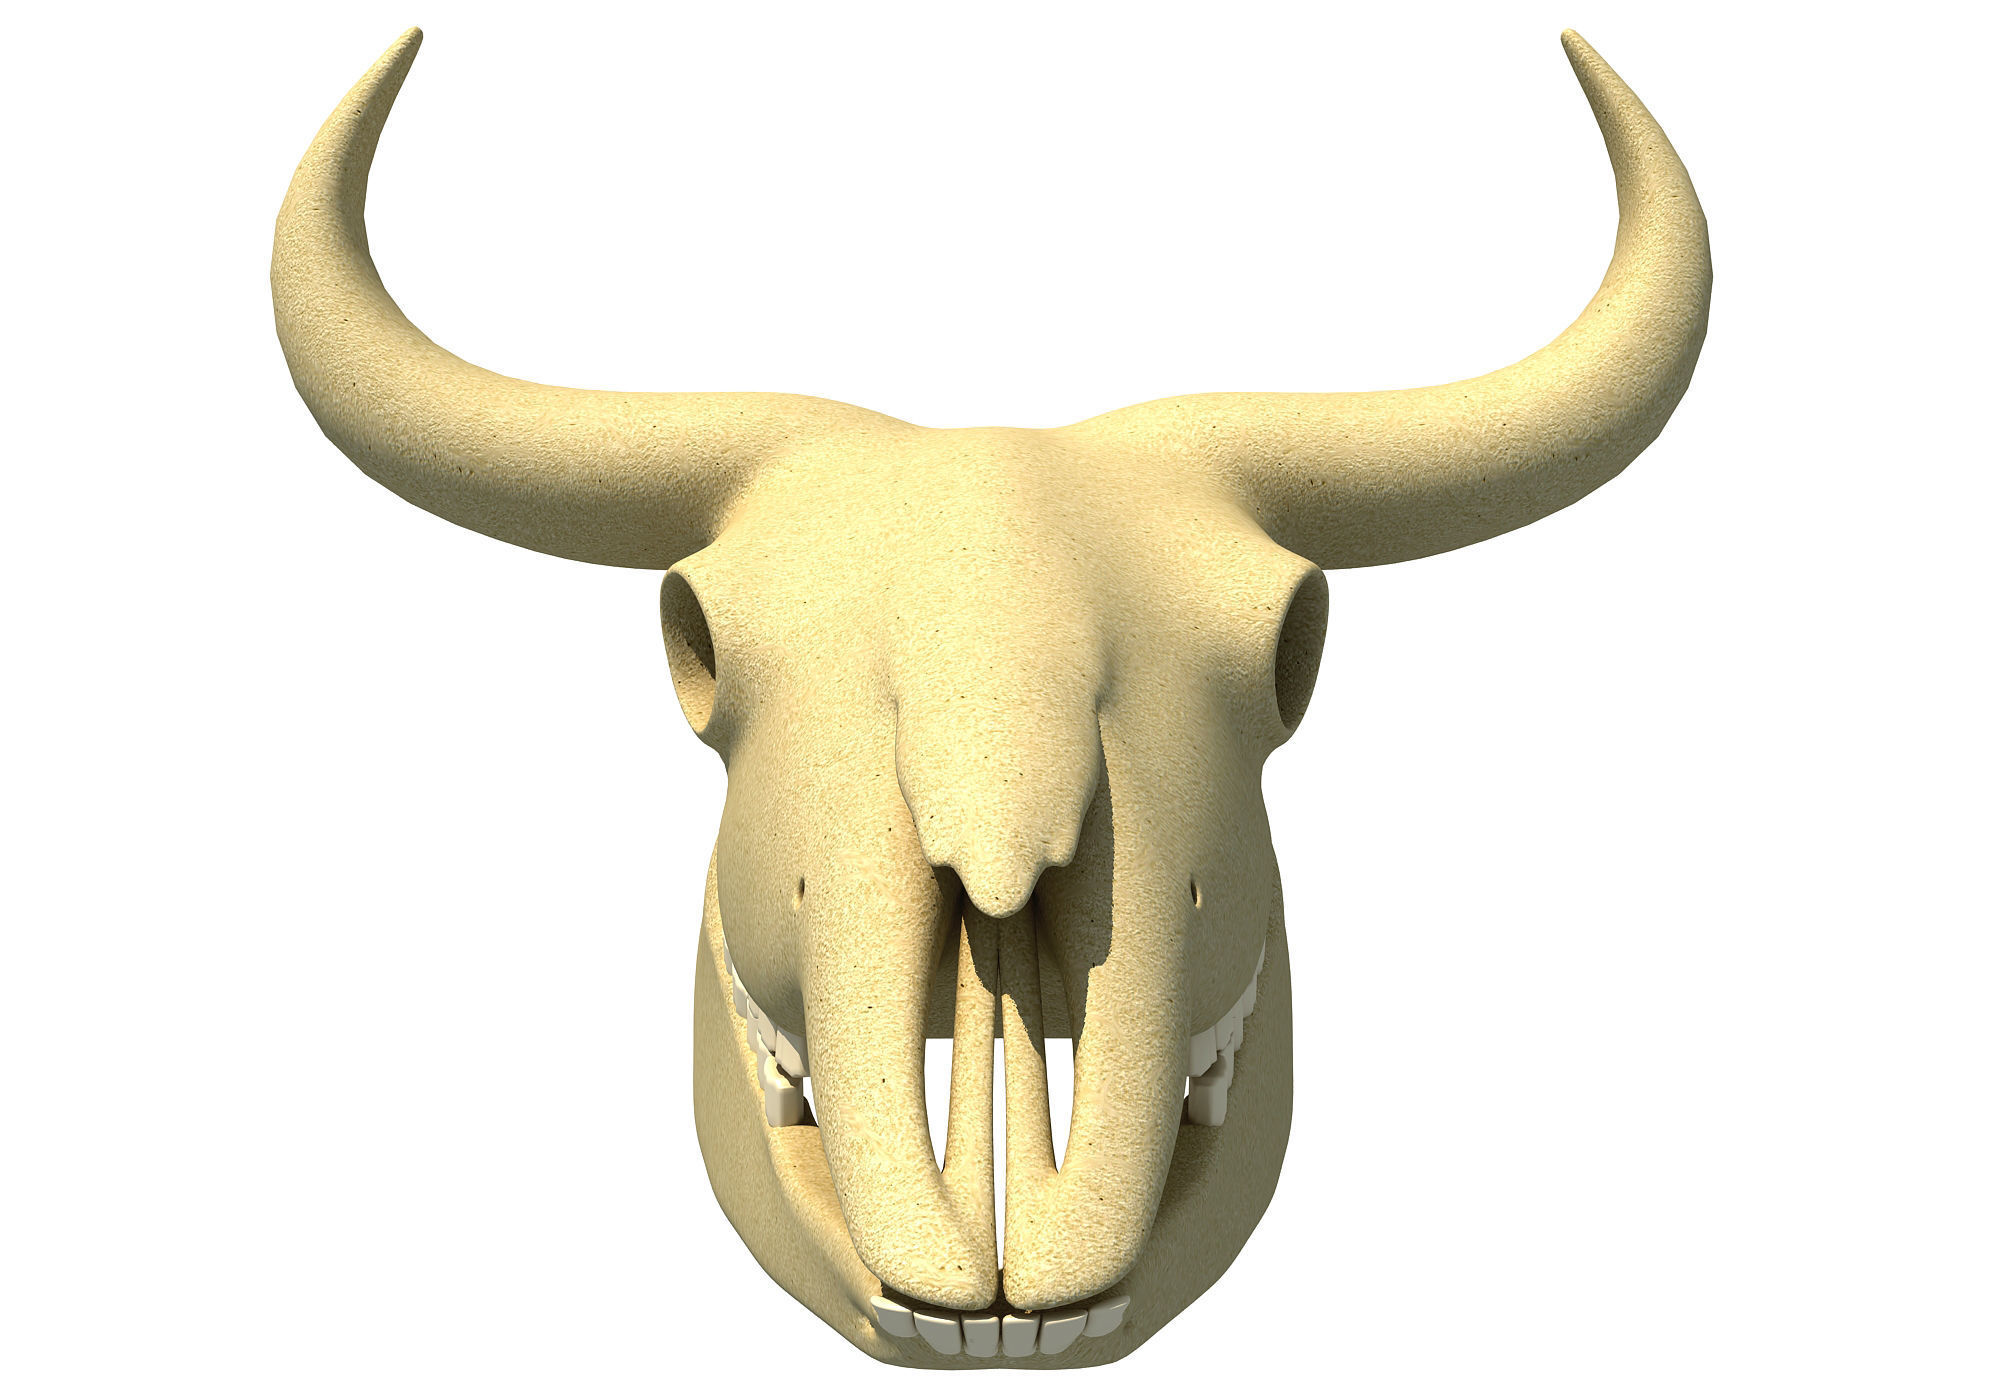 Bison Skull - Animal Skulls